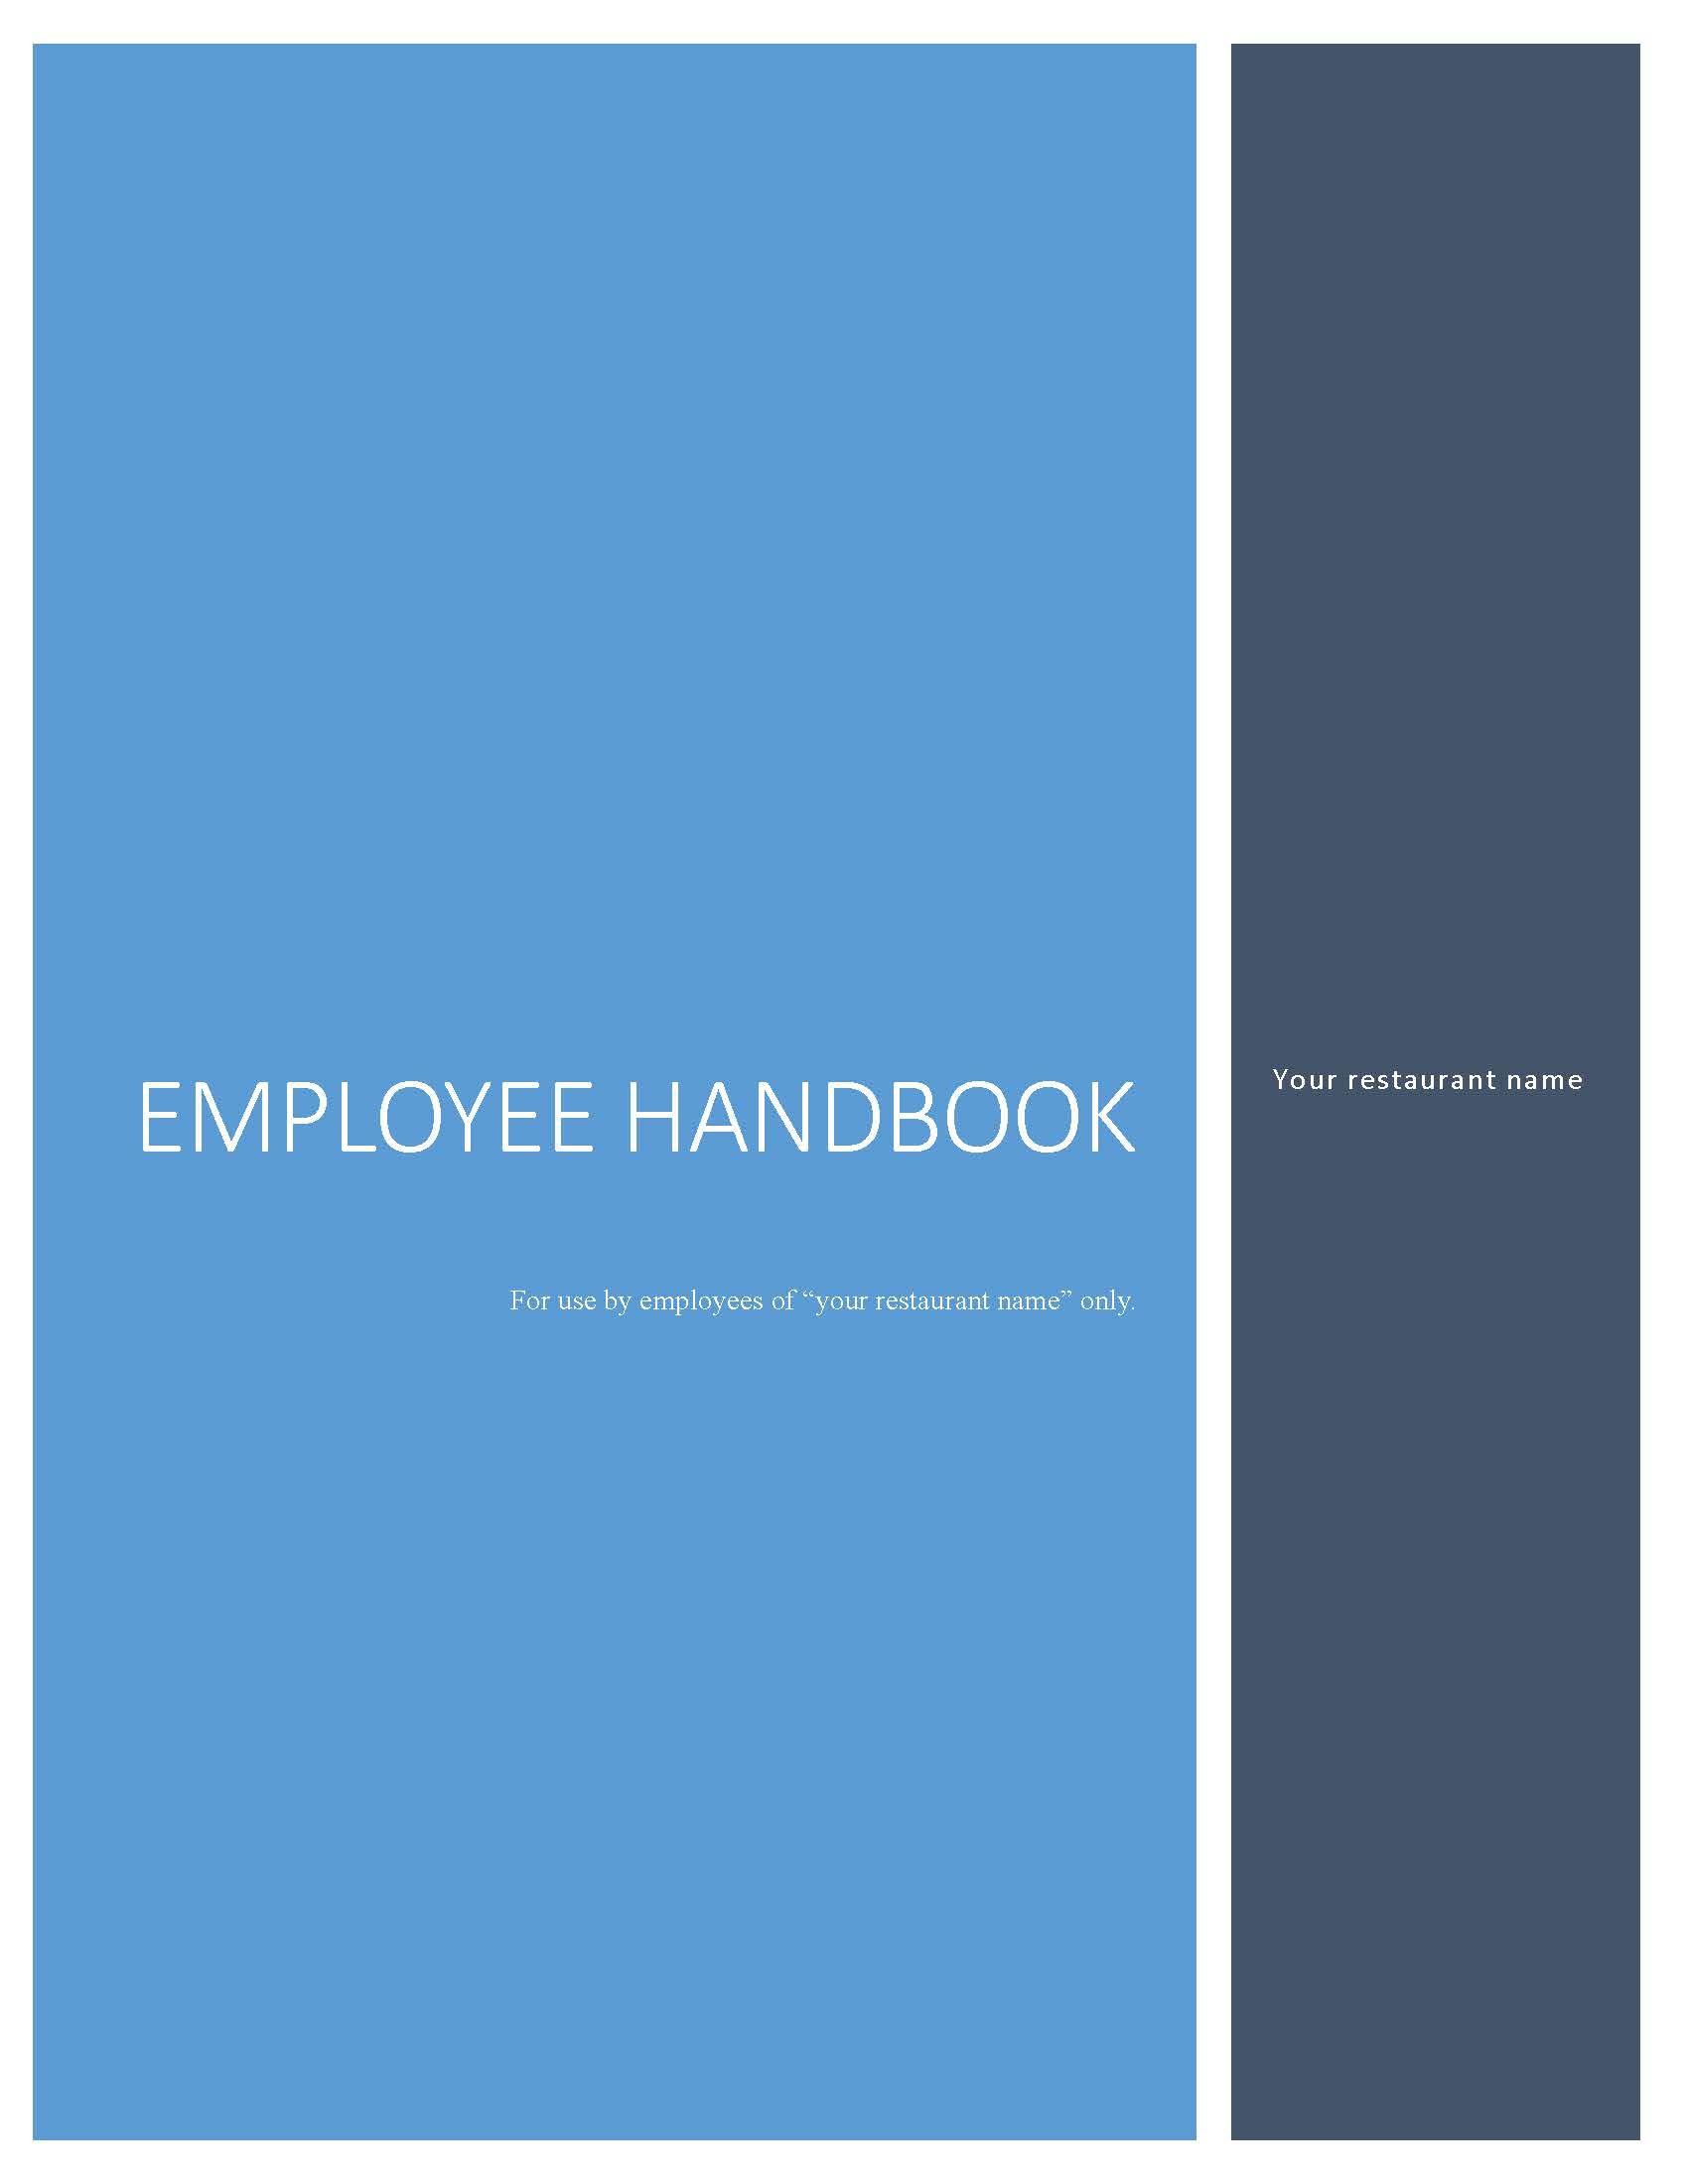 Restaurant Handbook Table Of Contents Restaurant Management Employee Handbook Restaurant